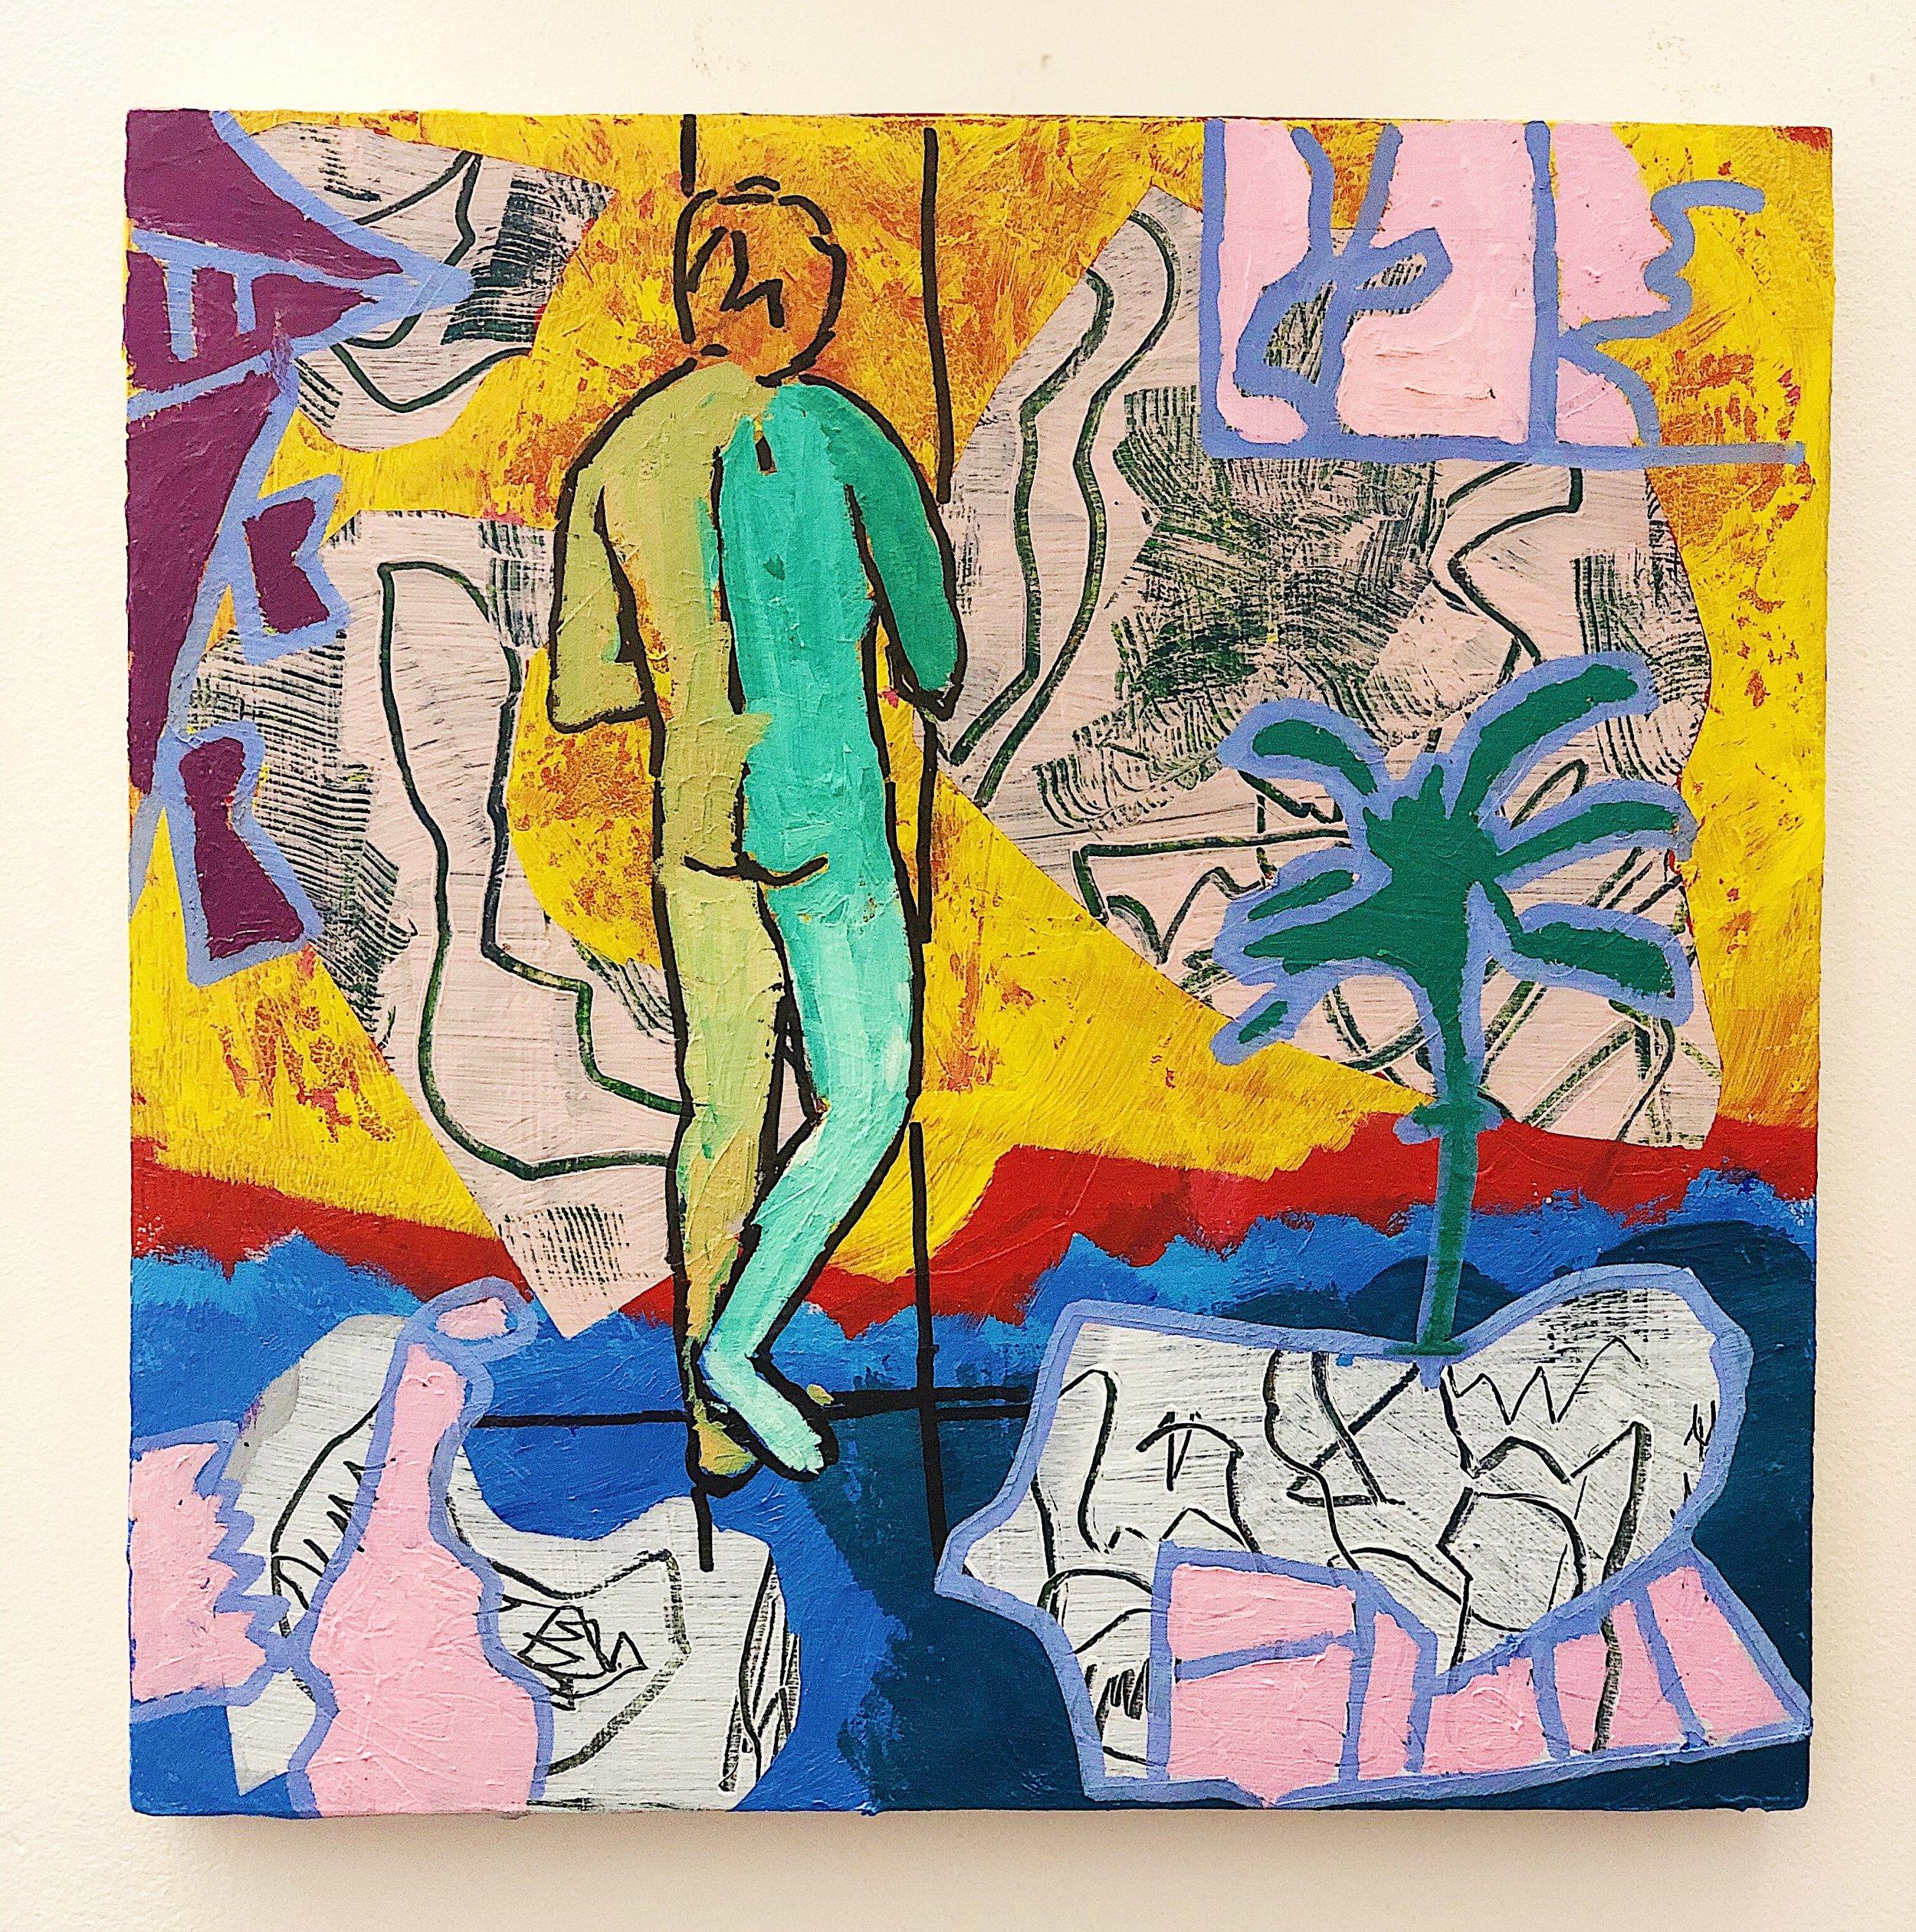 Green Harlequin at the Threshold  (2016)